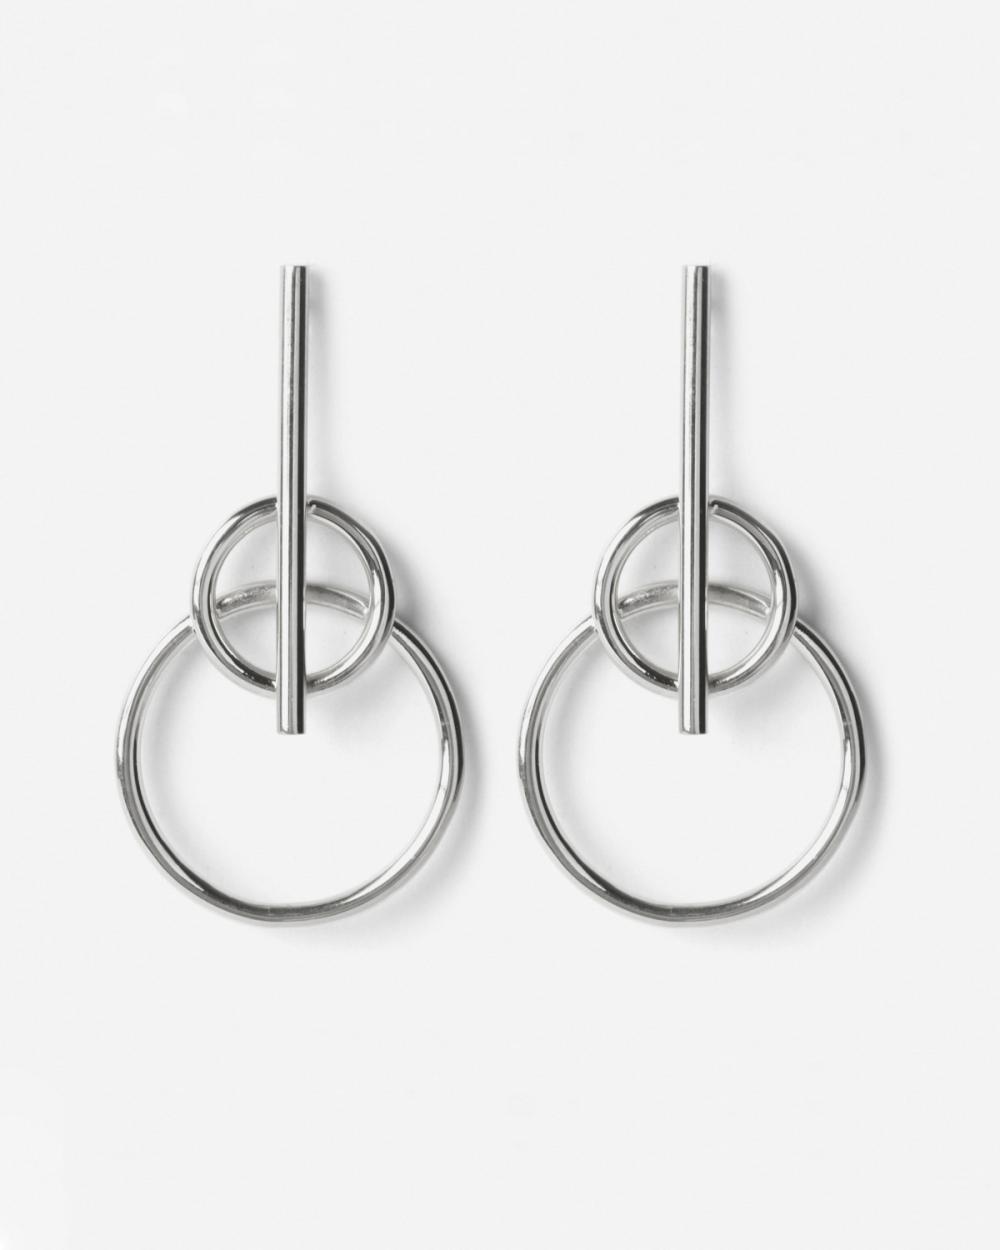 Earrings SILVER MARS EARRINGS NOVE25